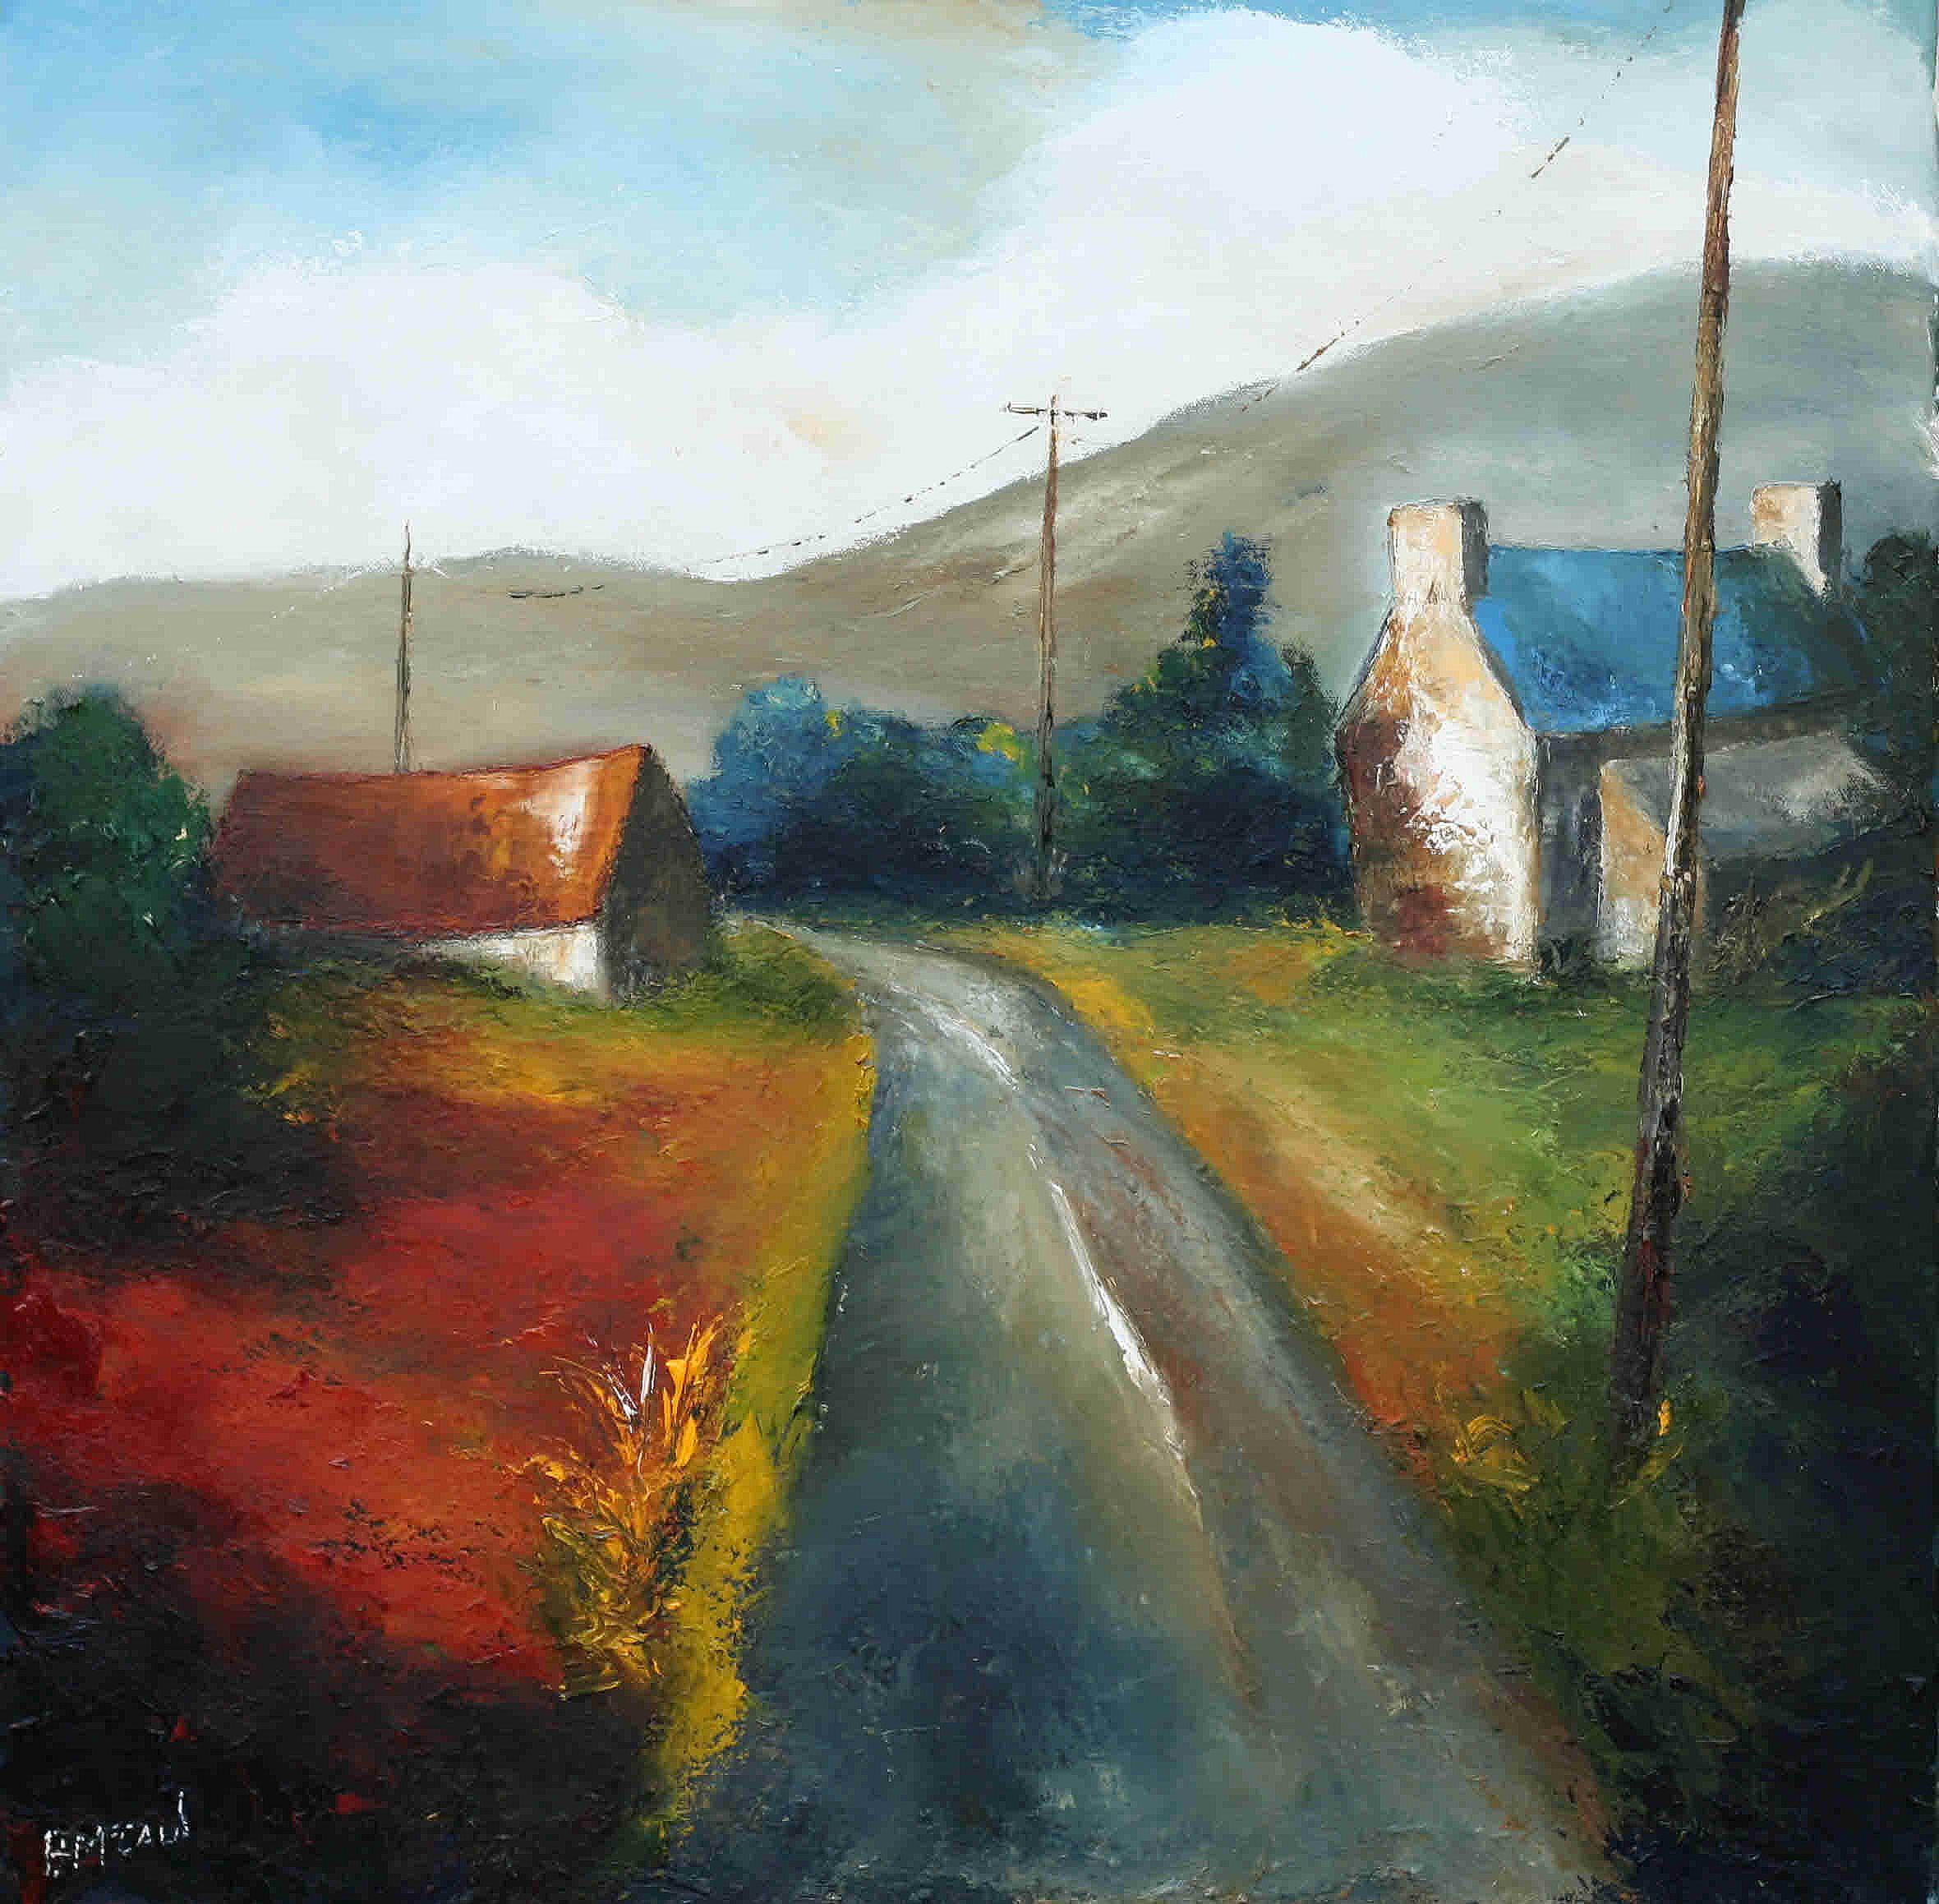 Monthly Payment Calculator >> A Passing Road by Padraig McCaul | Irish Art, The Doorway Gallery, Irish Art Gallery